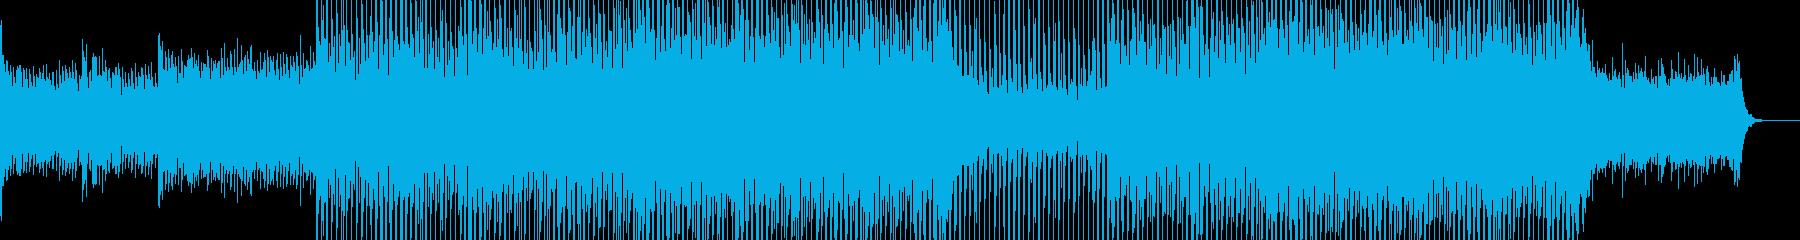 EDMクラブ系ダンスミュージック-33の再生済みの波形